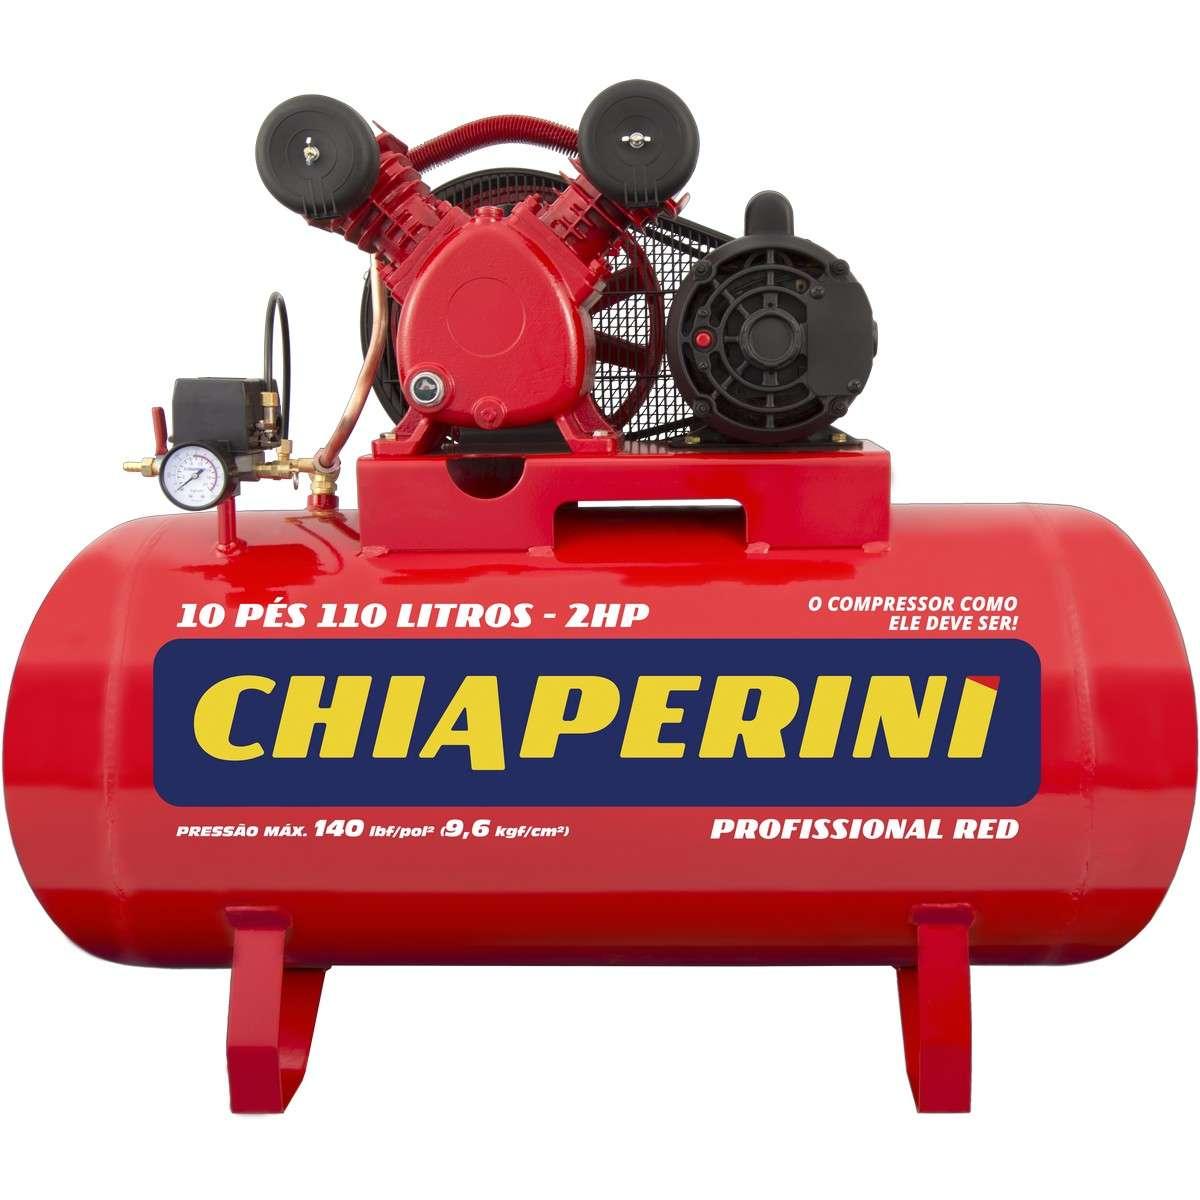 Compressor De Ar Chiaperini 10 Pés 110 Litros Red 140 Lbf Monofásico